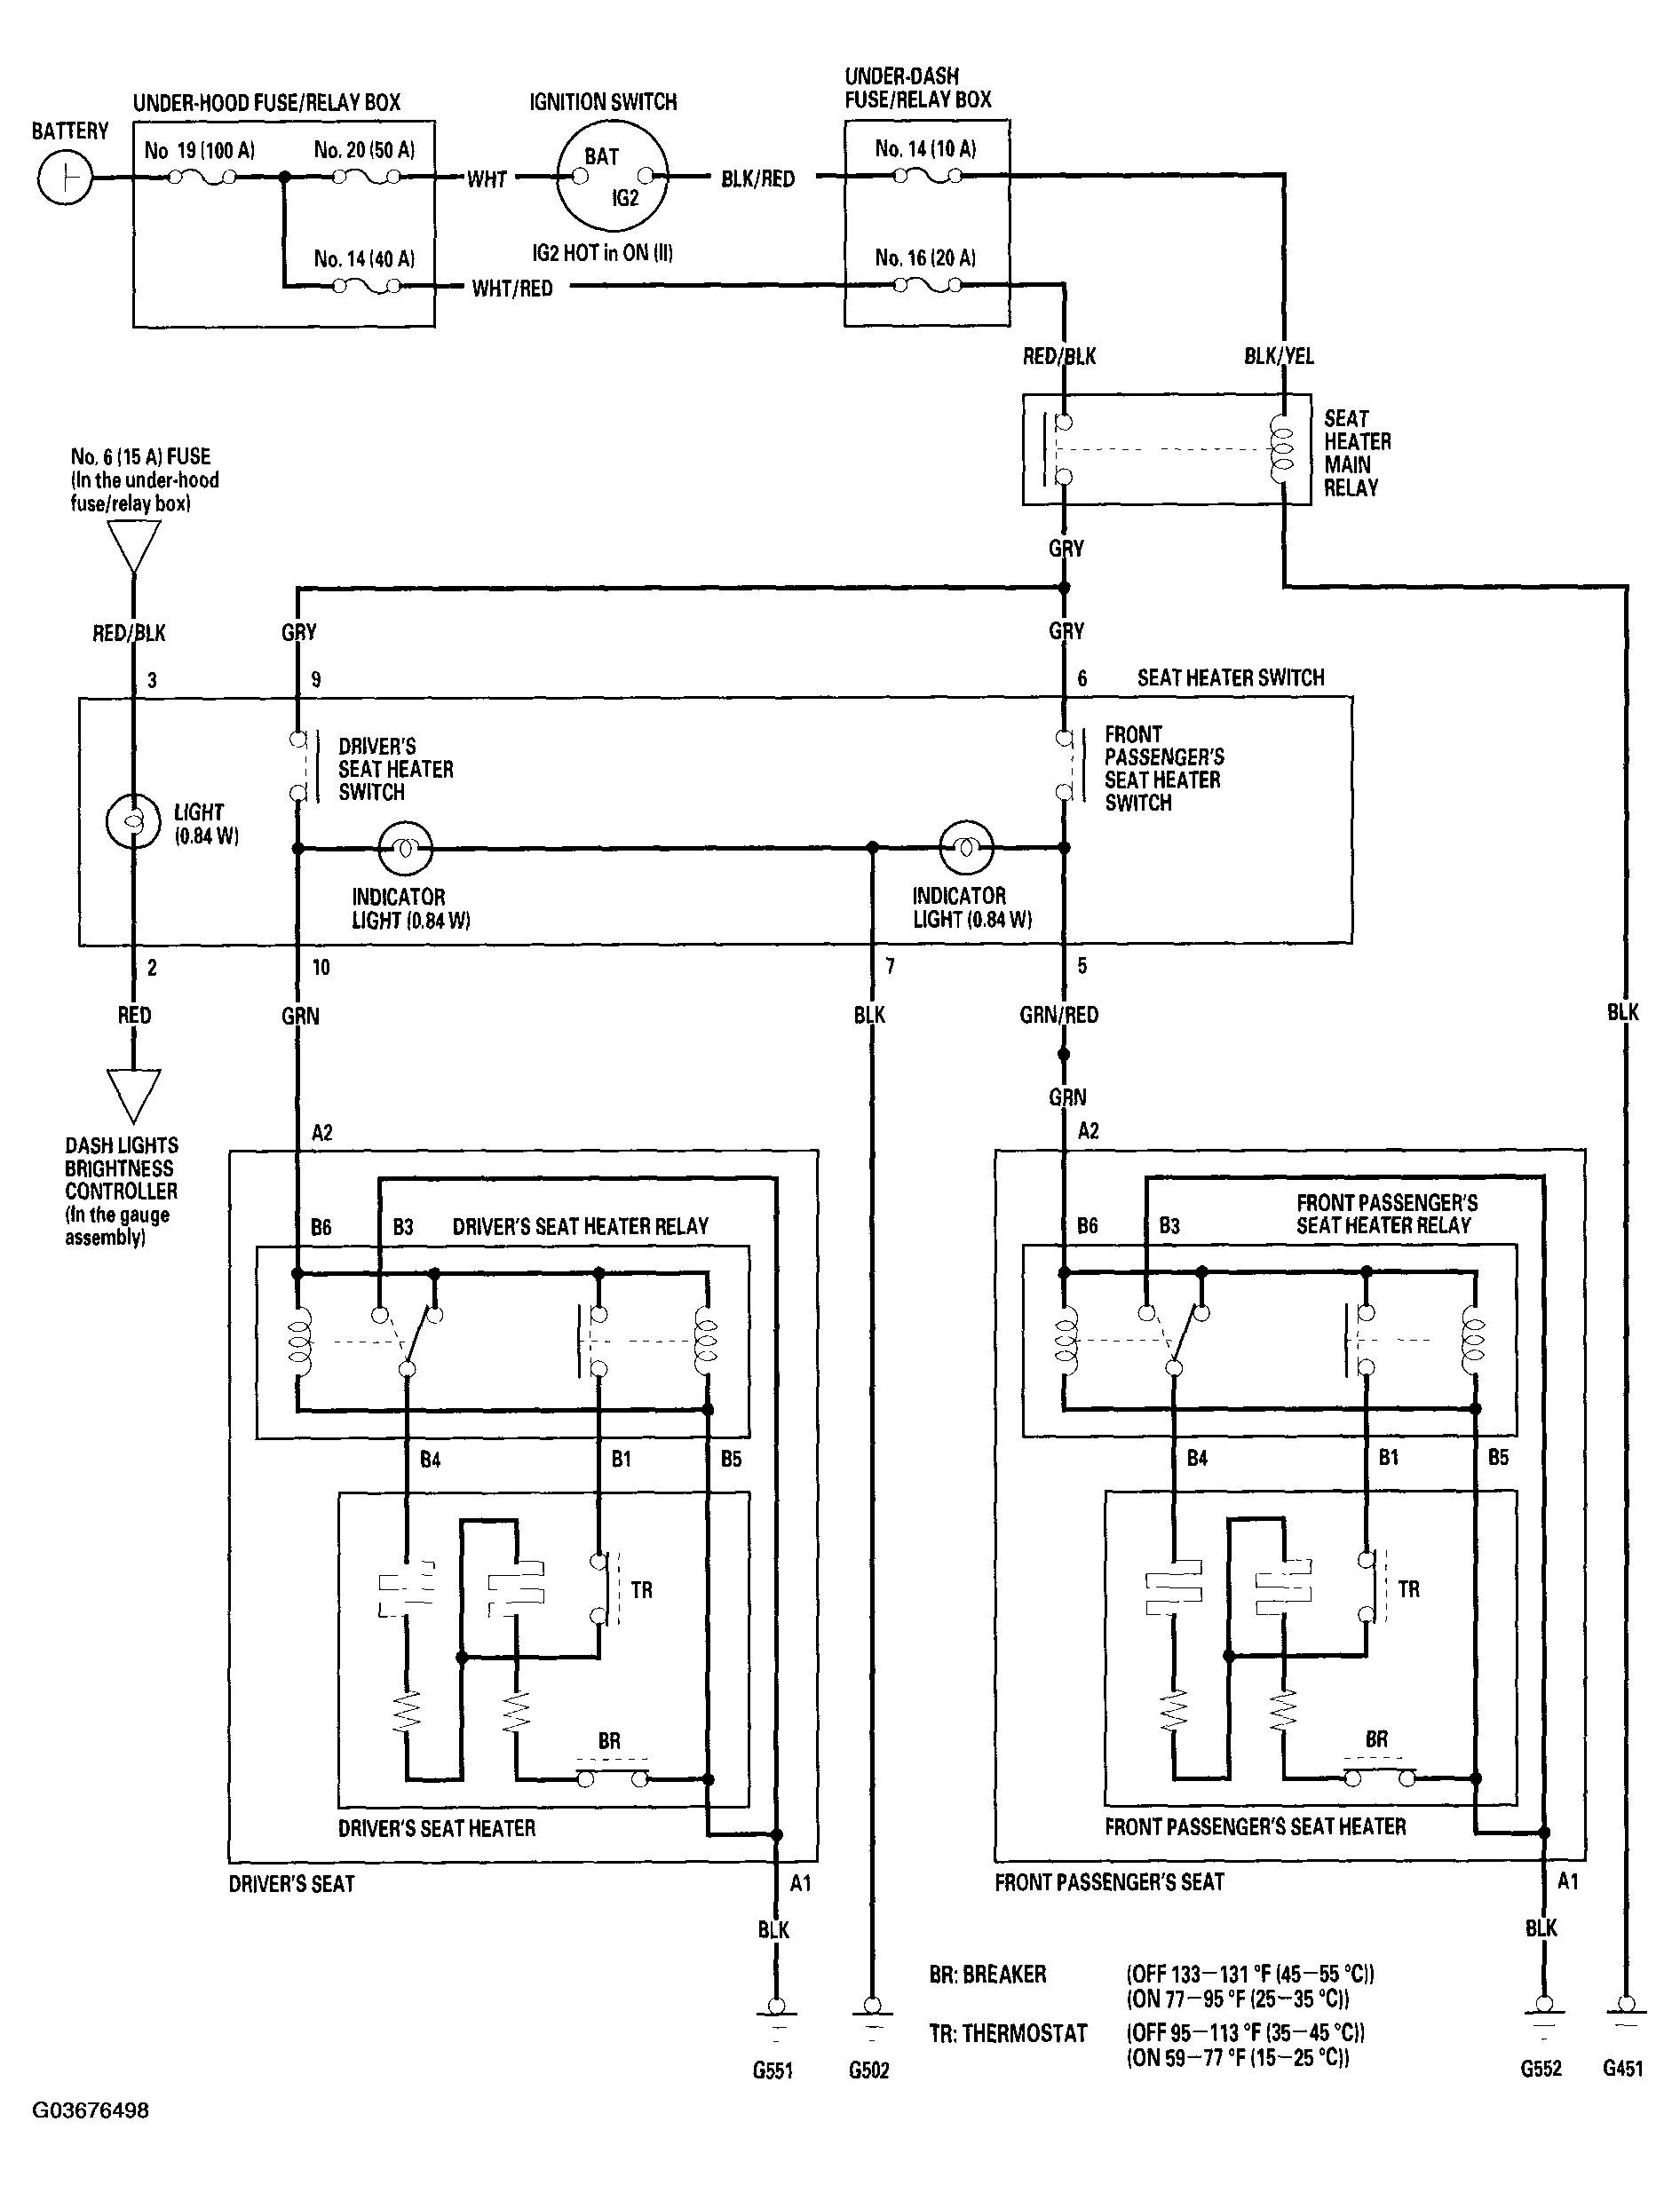 2000 Civic Engine Diagram 1994 Honda Accord Engine Diagram Cr V Fuse Box Diagram Besides Honda Of 2000 Civic Engine Diagram